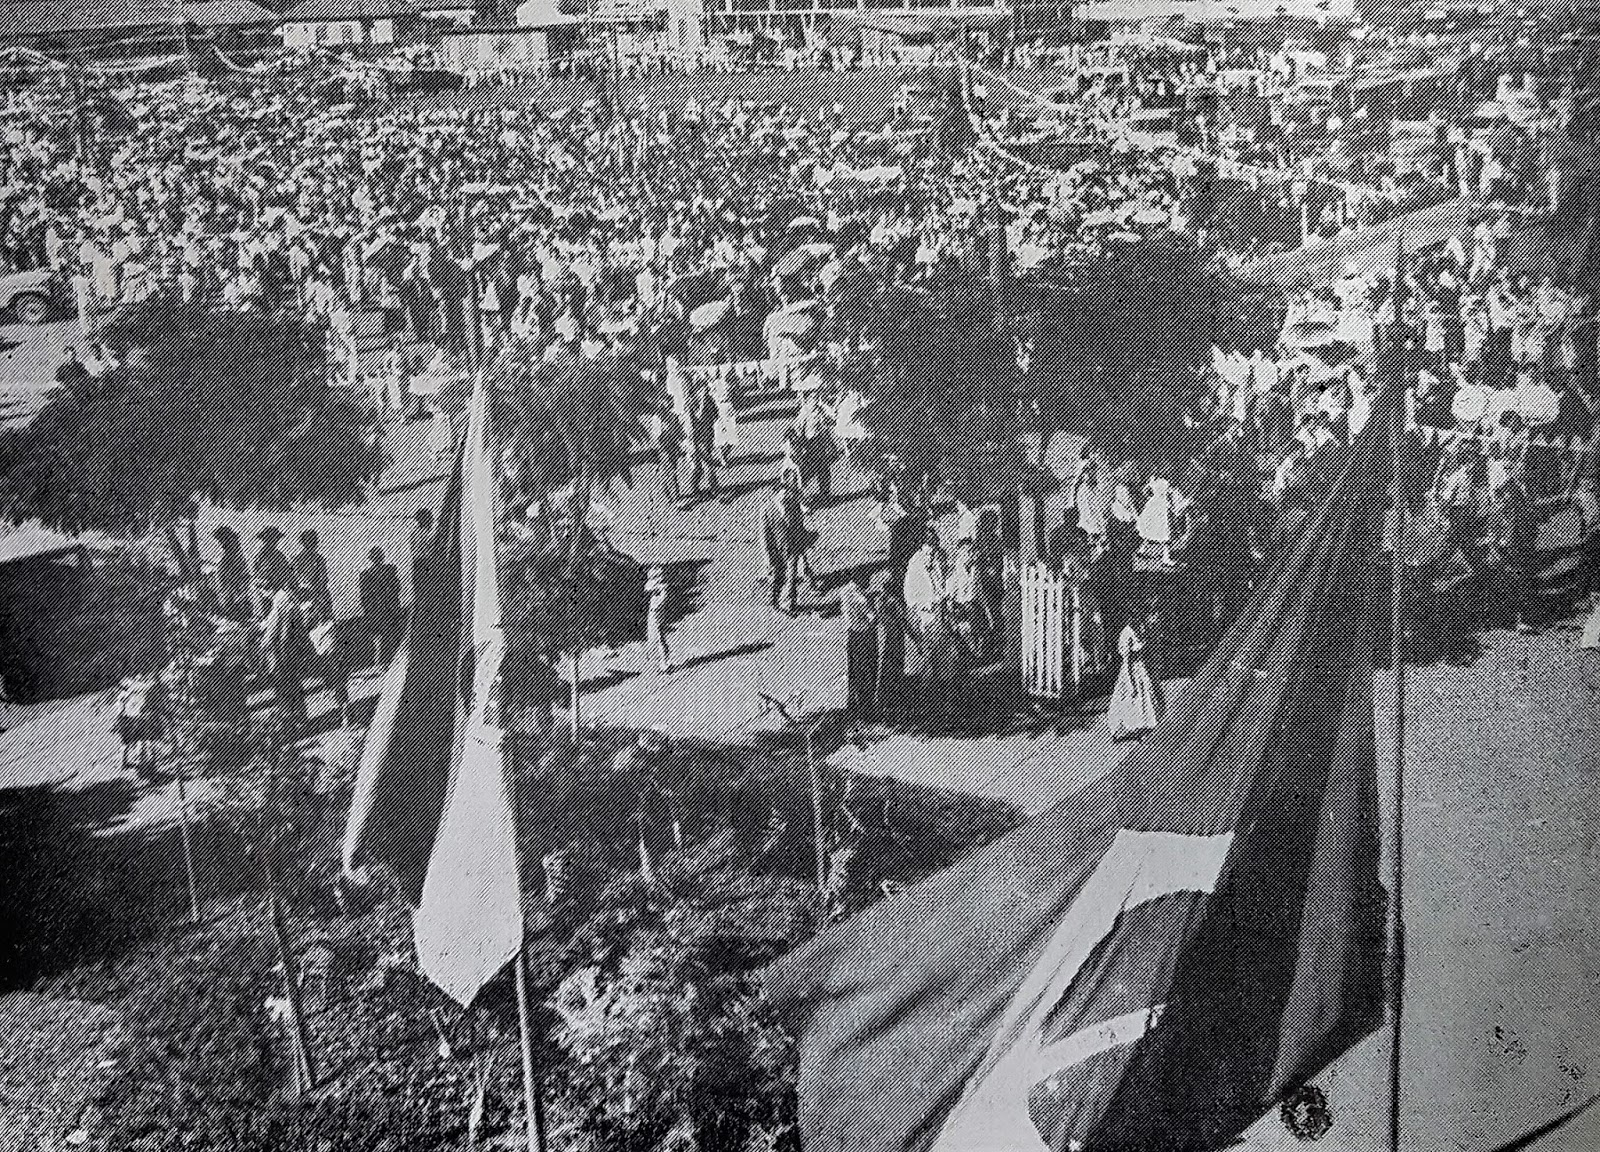 Vista da sacada do Grande Hotel Maringá - 1957